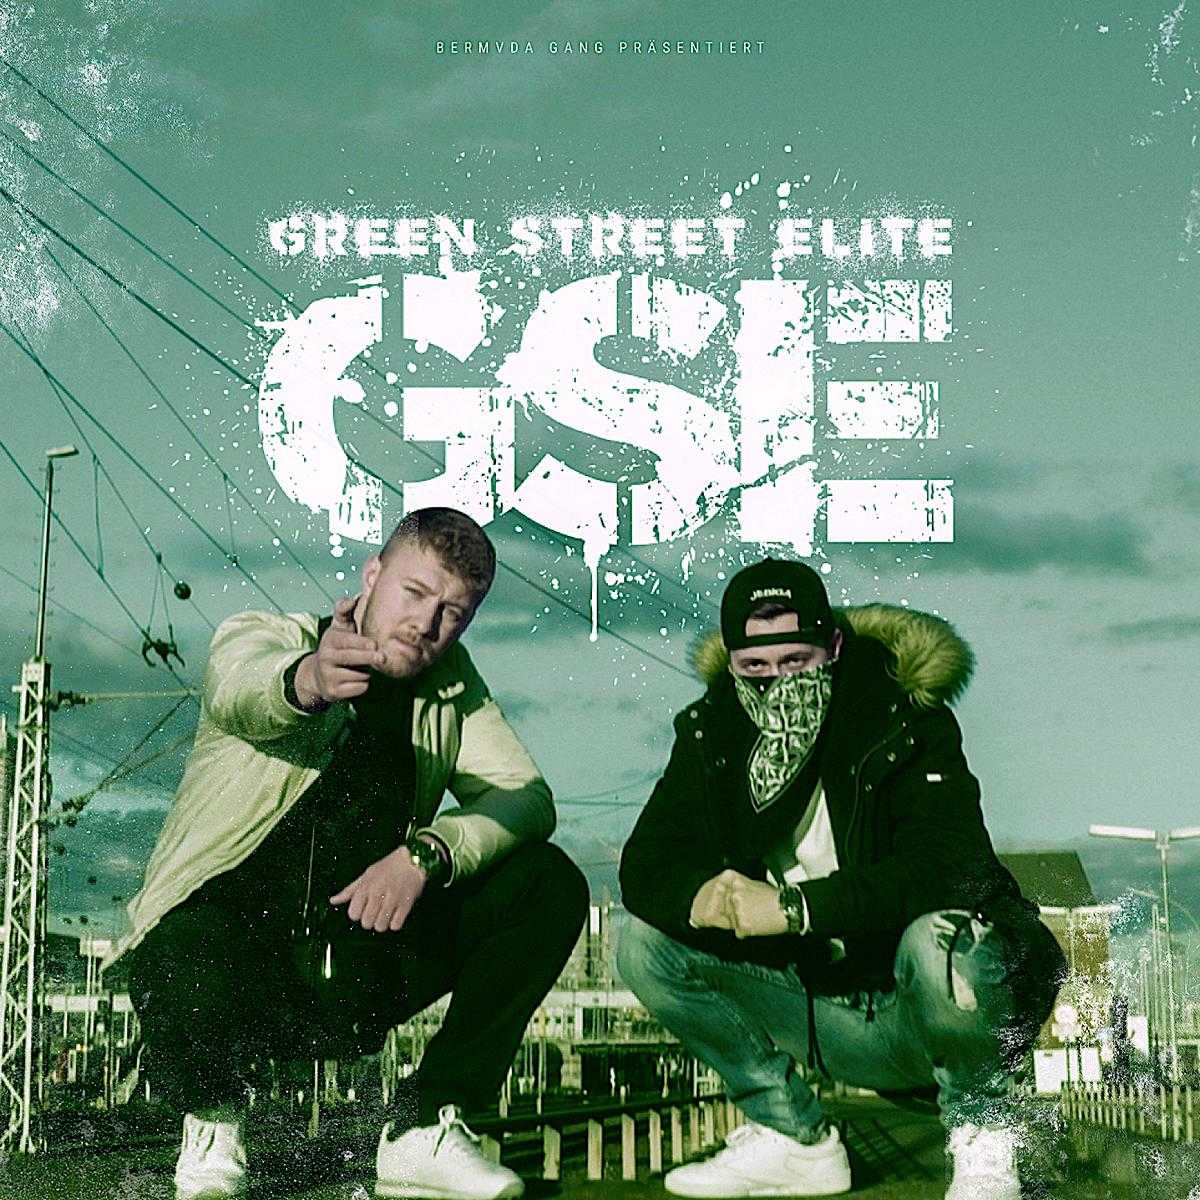 Upcoming: Jugo Uno & Jean - Green Street Elite (GSE)